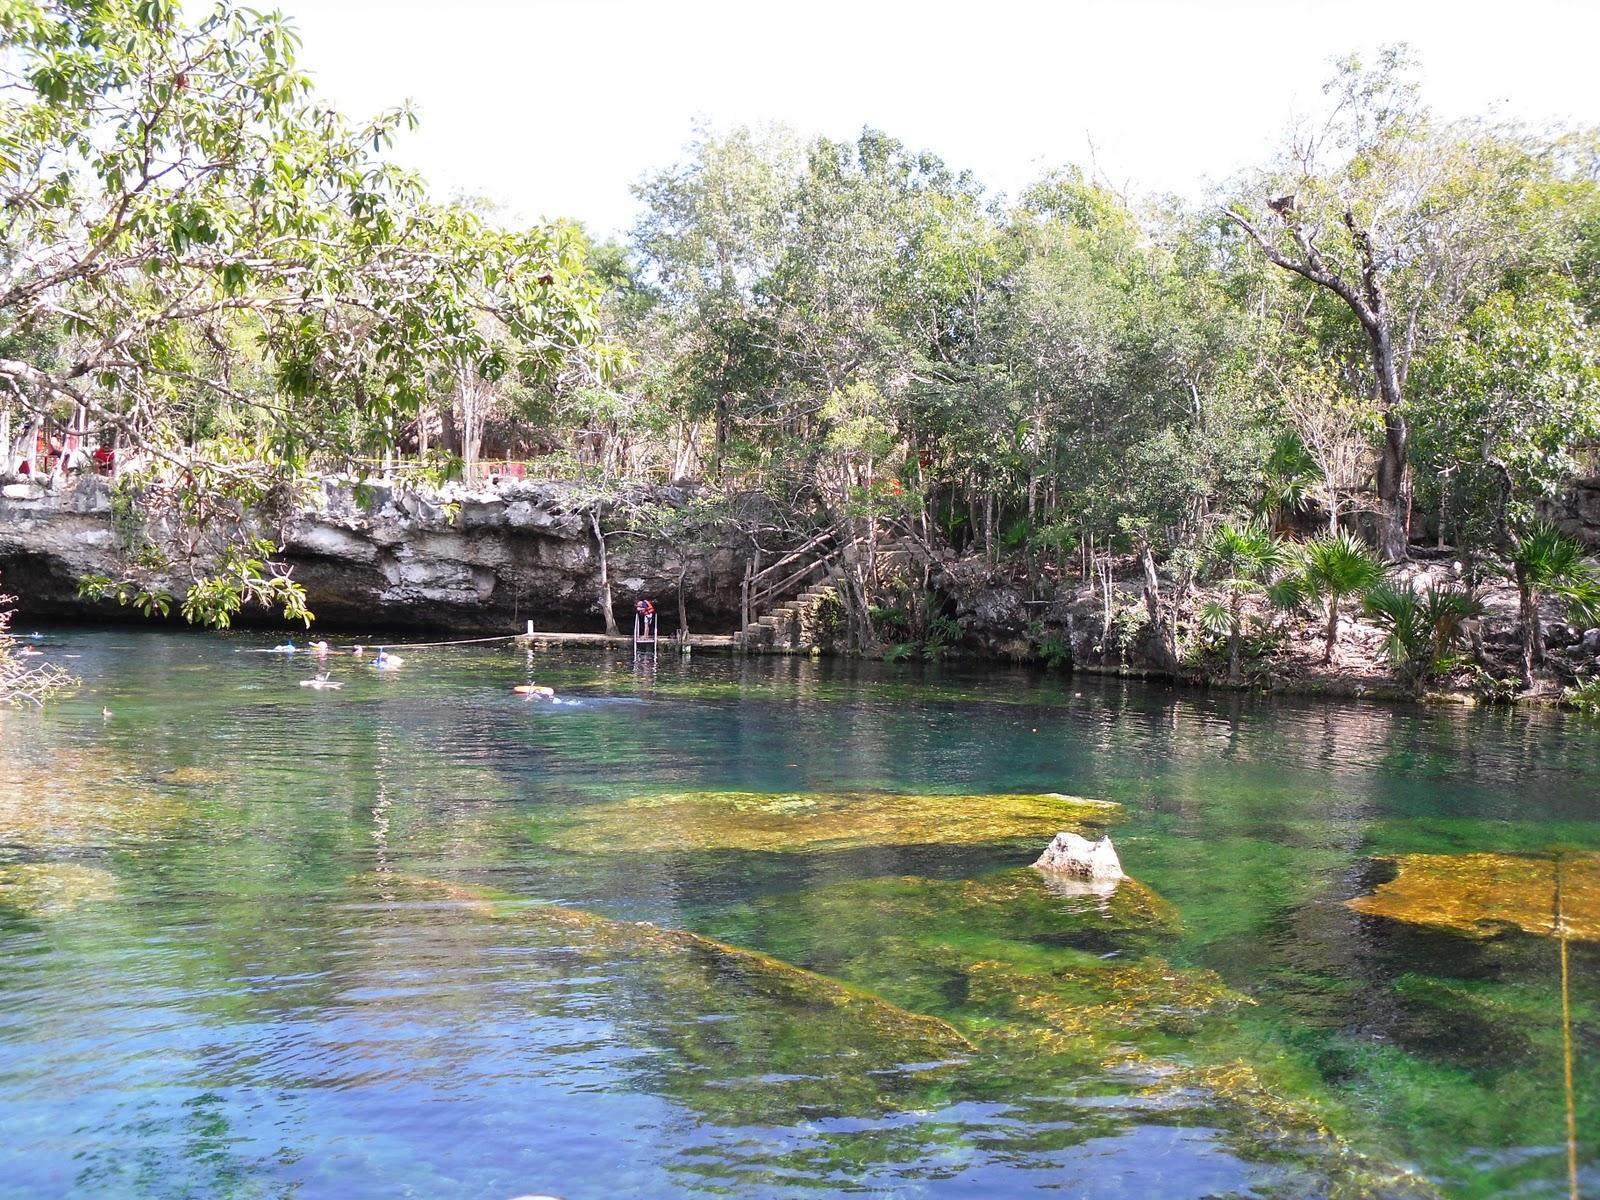 Puerto aventuras feb 2011 cenote jardin del eden for Jardin del eden